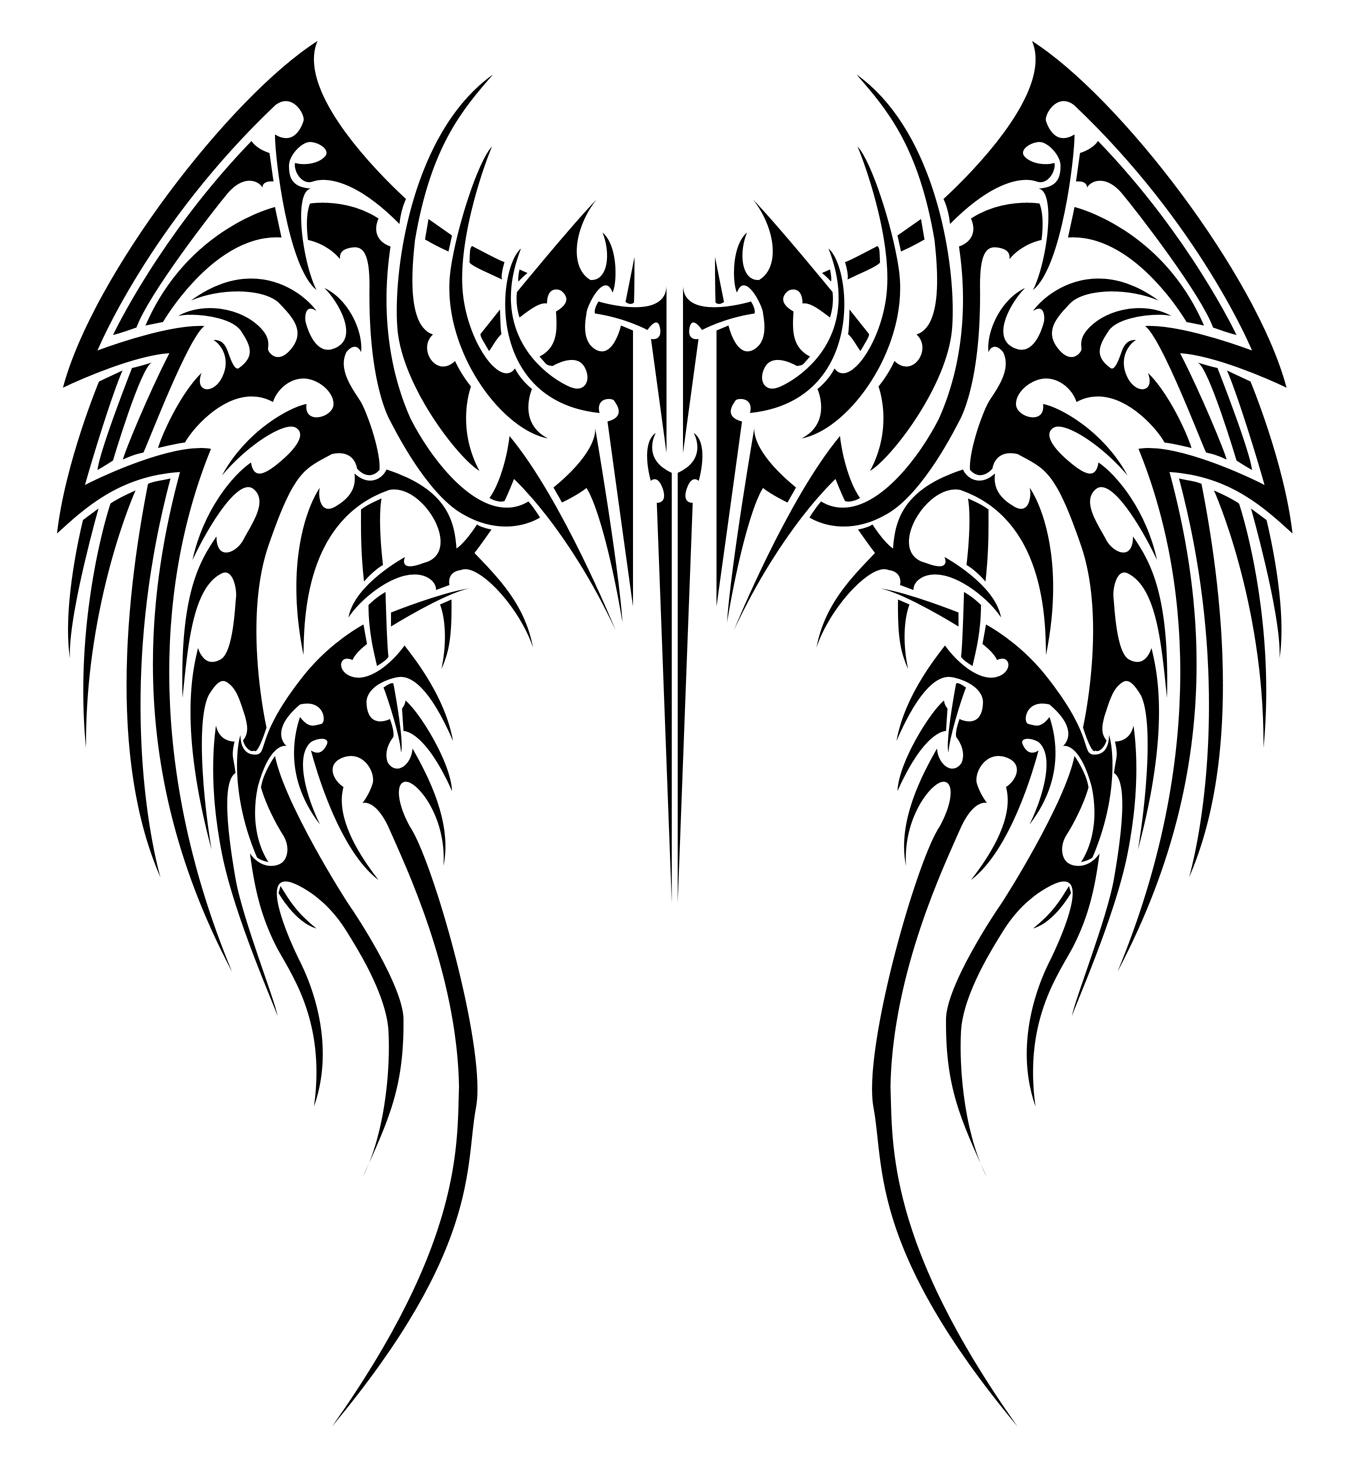 Angelic tribal wings